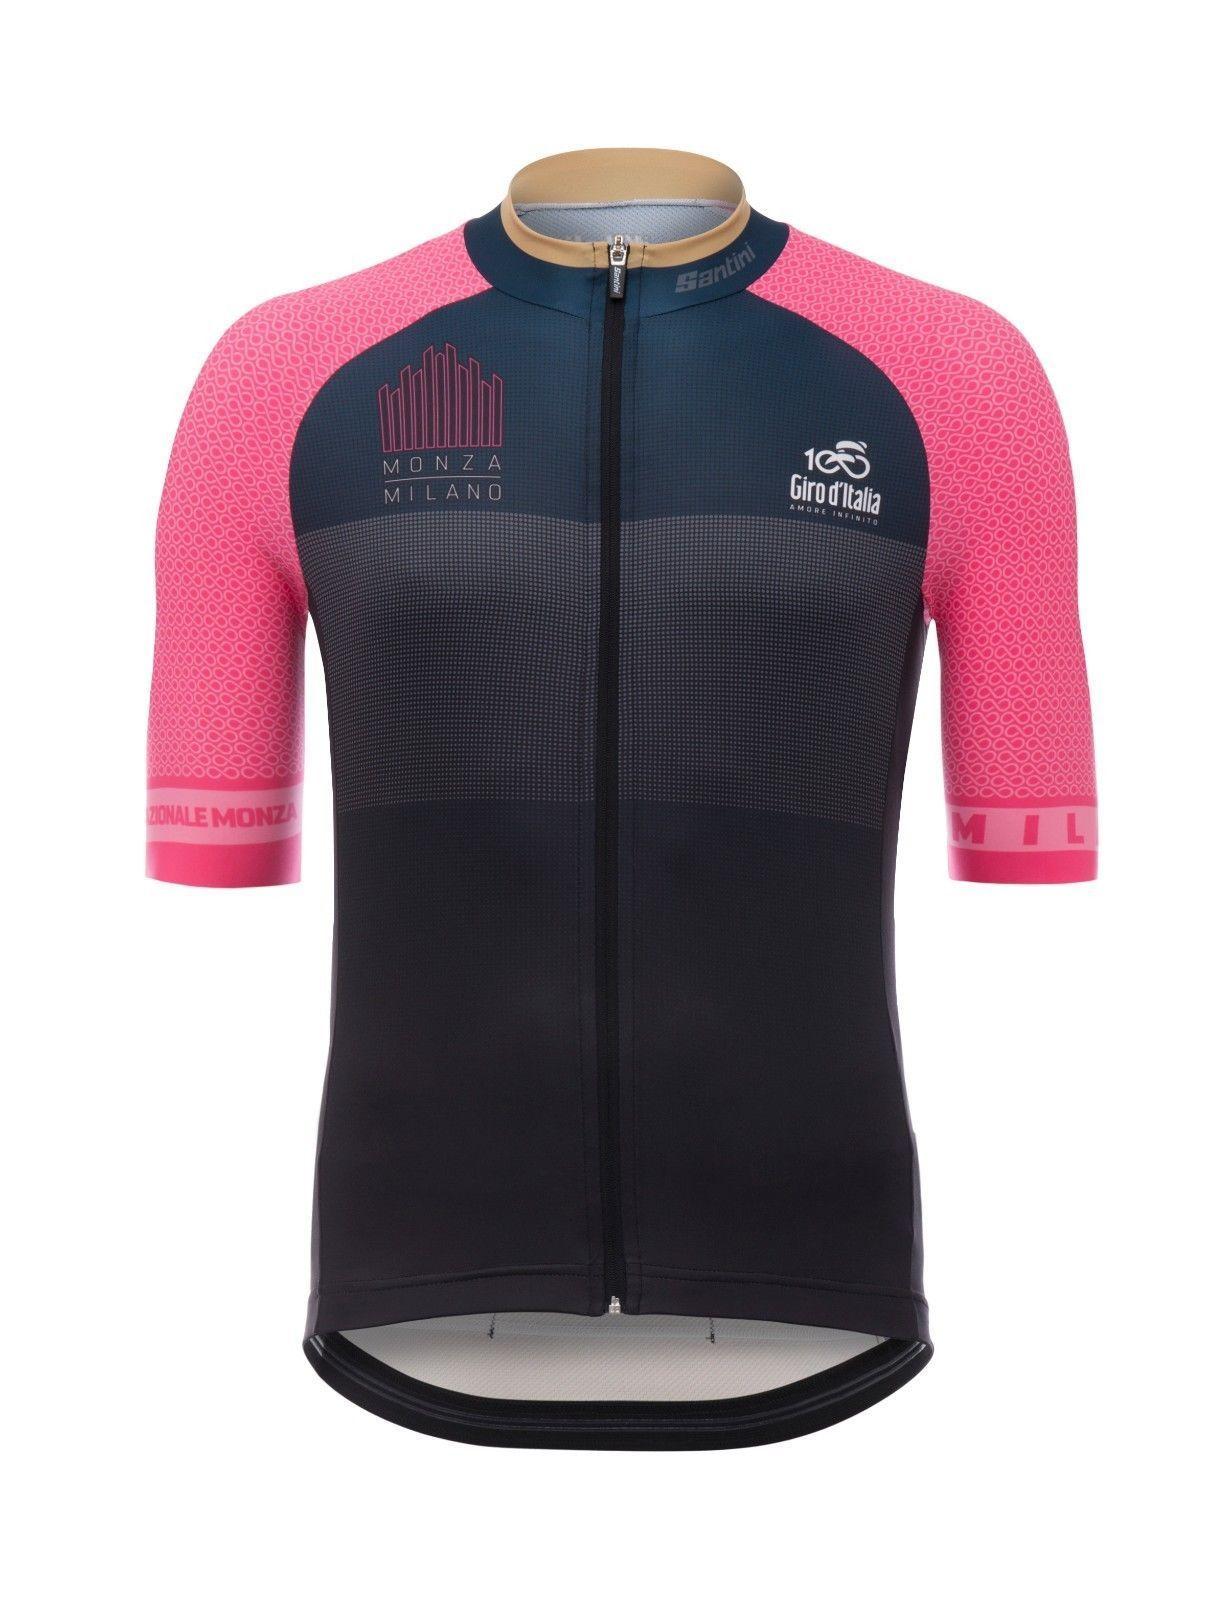 2017 Giro d/'Italia Stage 21 Monza Milano Cycling Bib Shorts by Santini